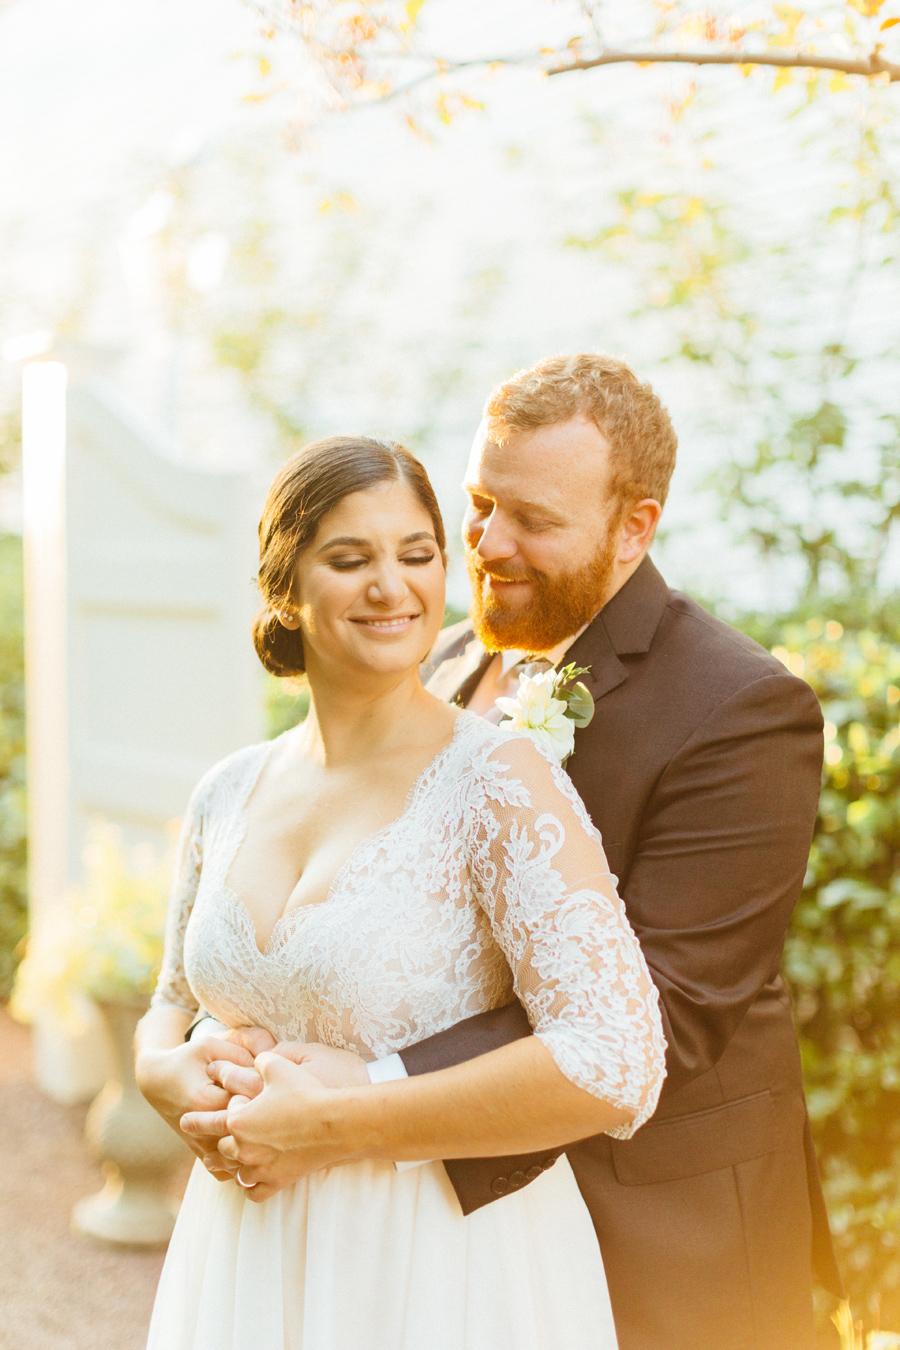 the-inn-at-leola-wedding-lancaster-pennsylvania-wedding-photographer-rebeka-viola-photograhy (87).jpg